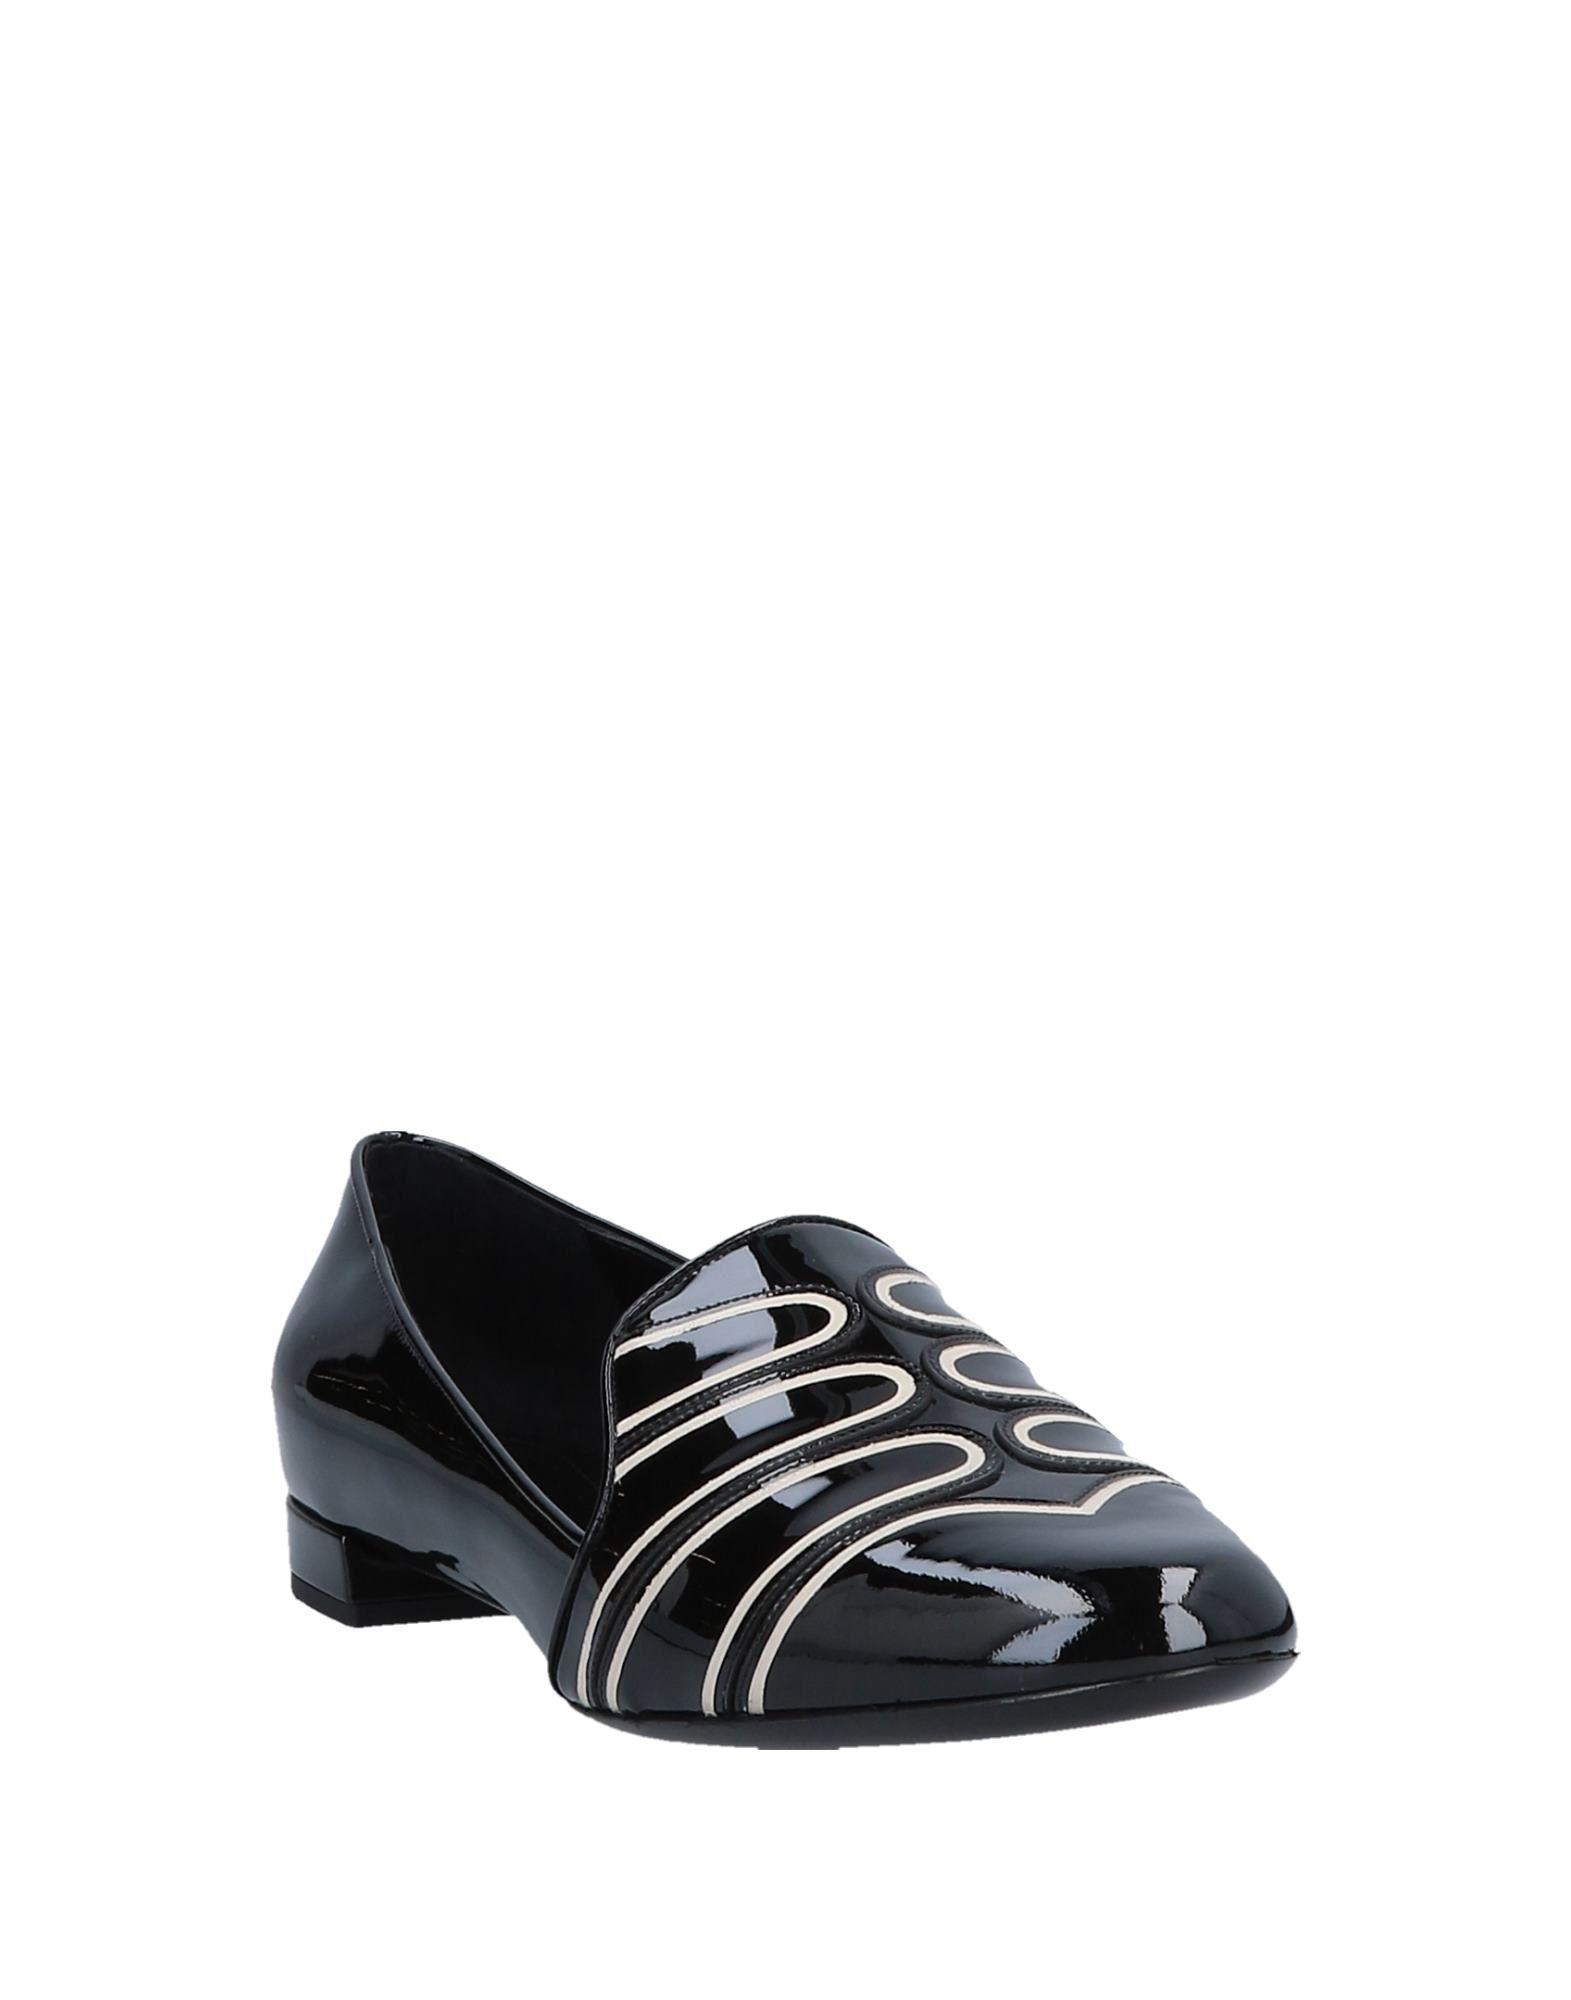 Giorgio Armani gut Mokassins Damen  11563237UJGünstige gut Armani aussehende Schuhe 513492